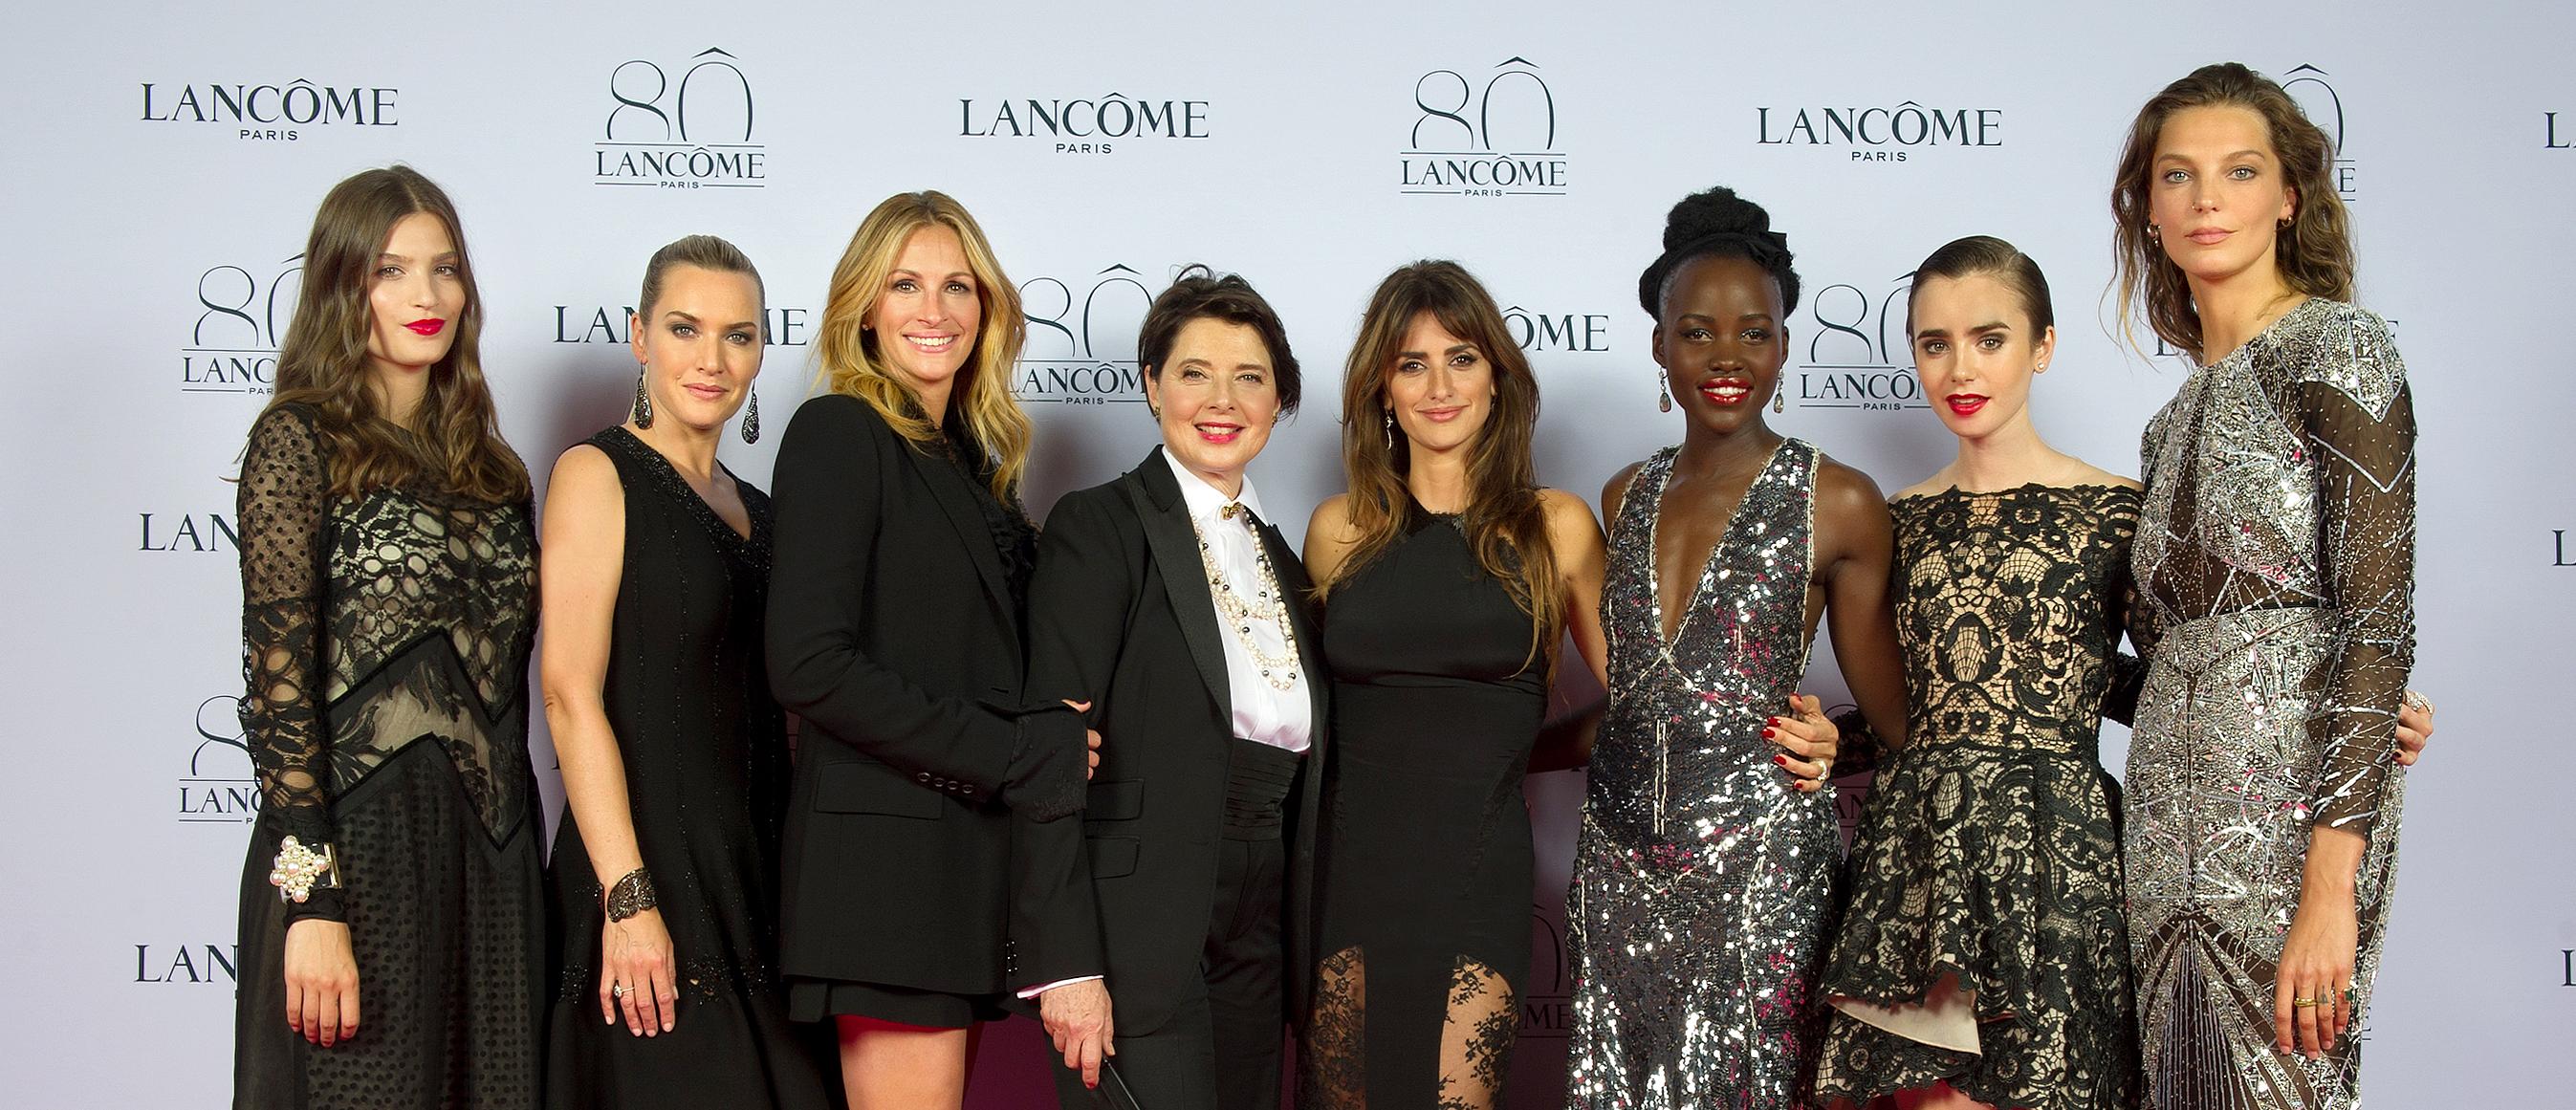 Embajadoras fiesta 80 aniversario Lancôme